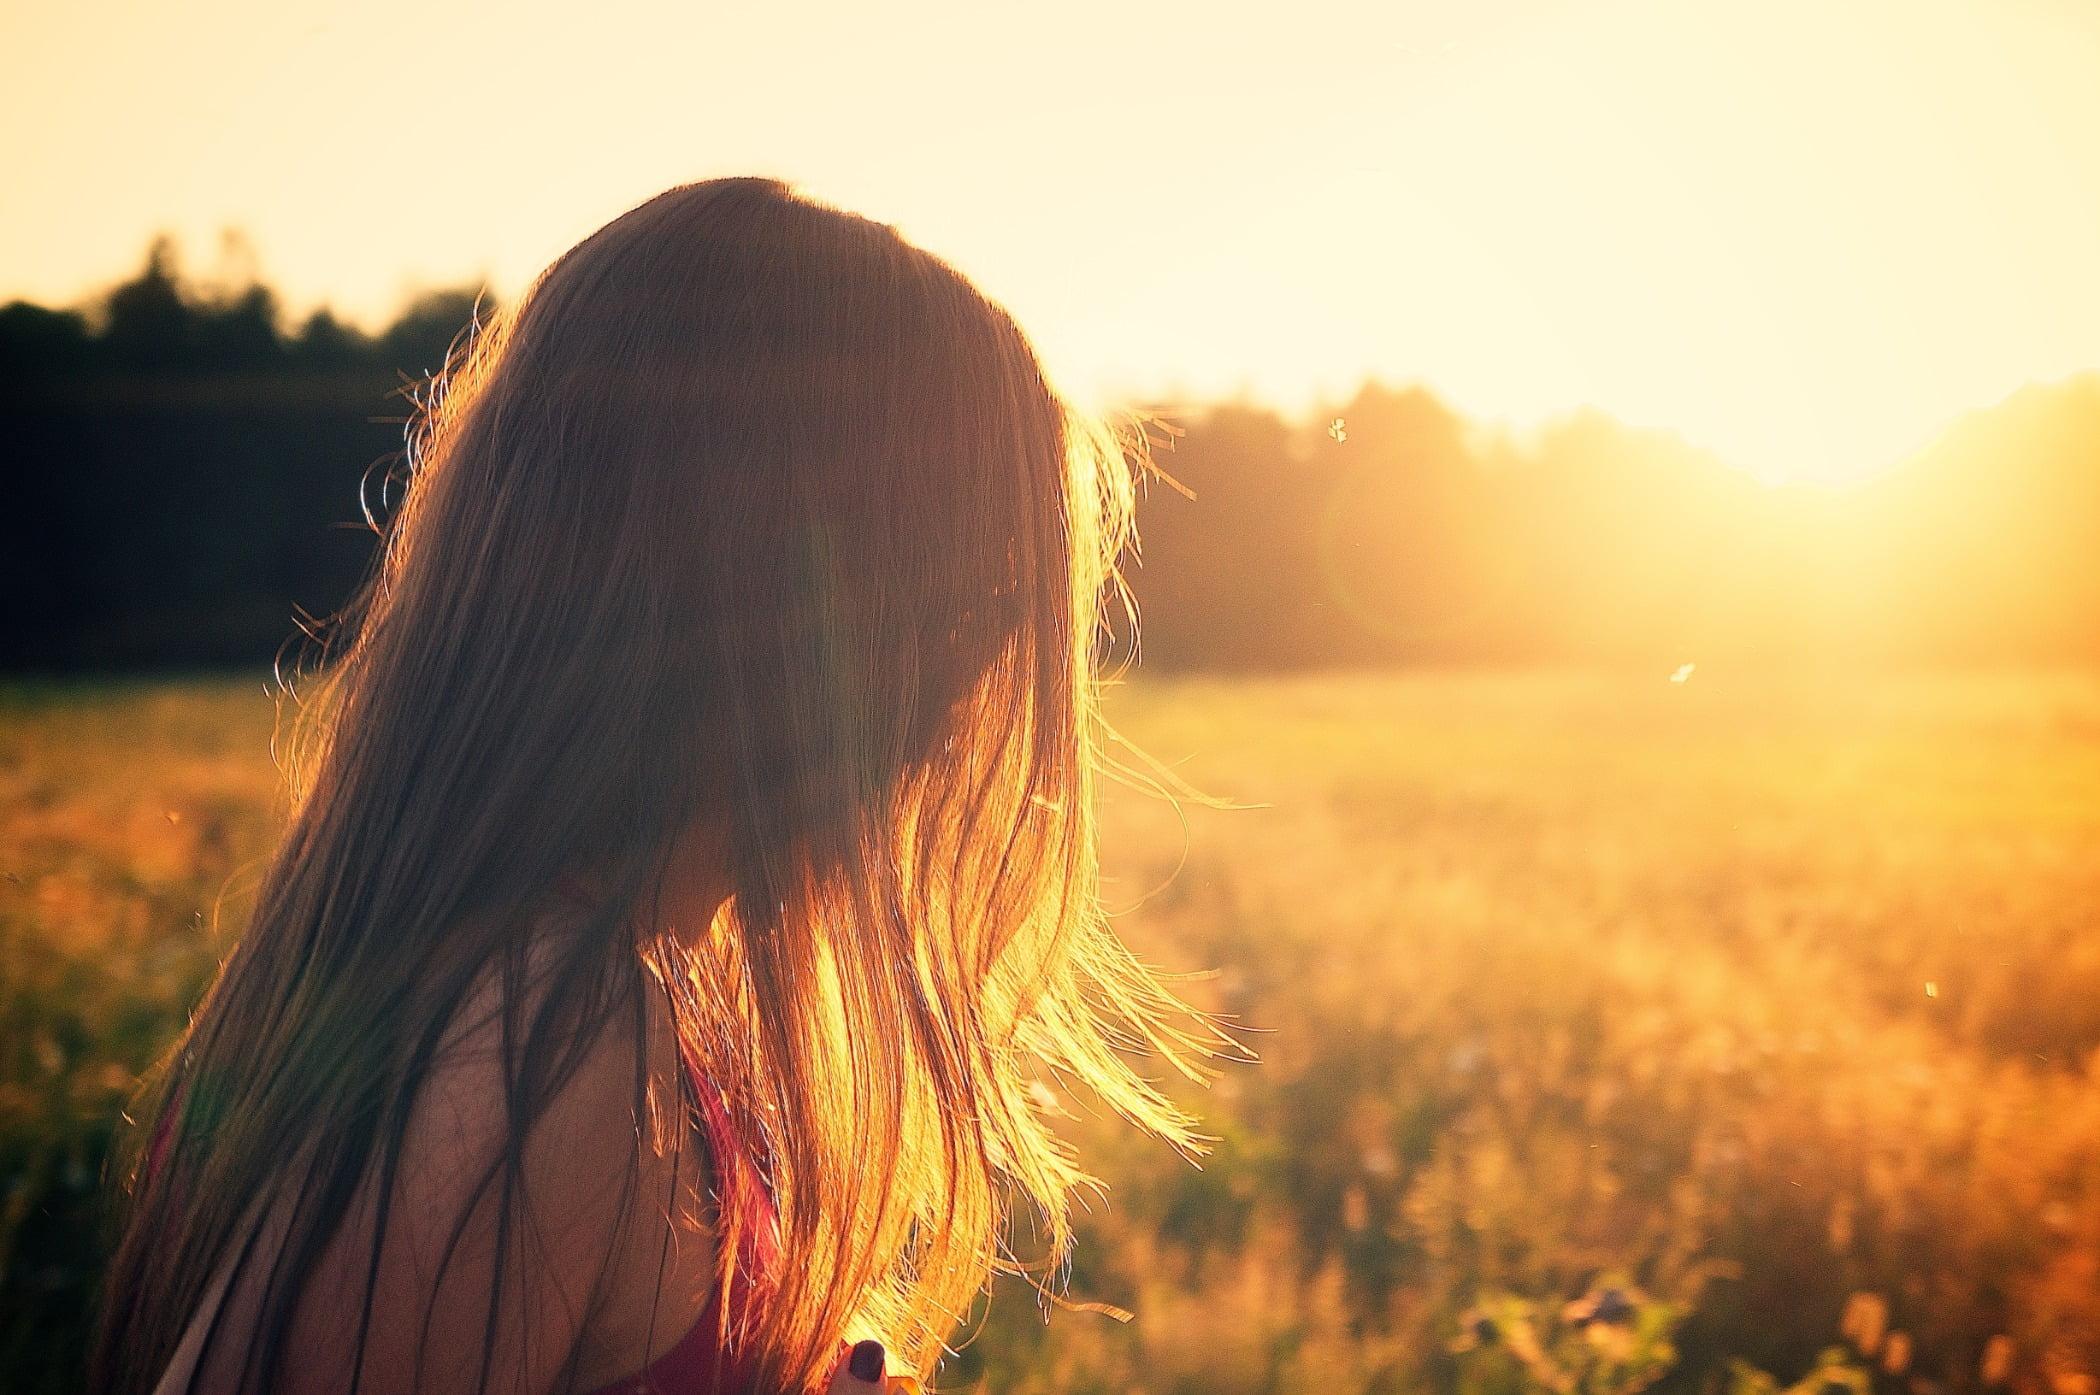 summerfield, woman, girl